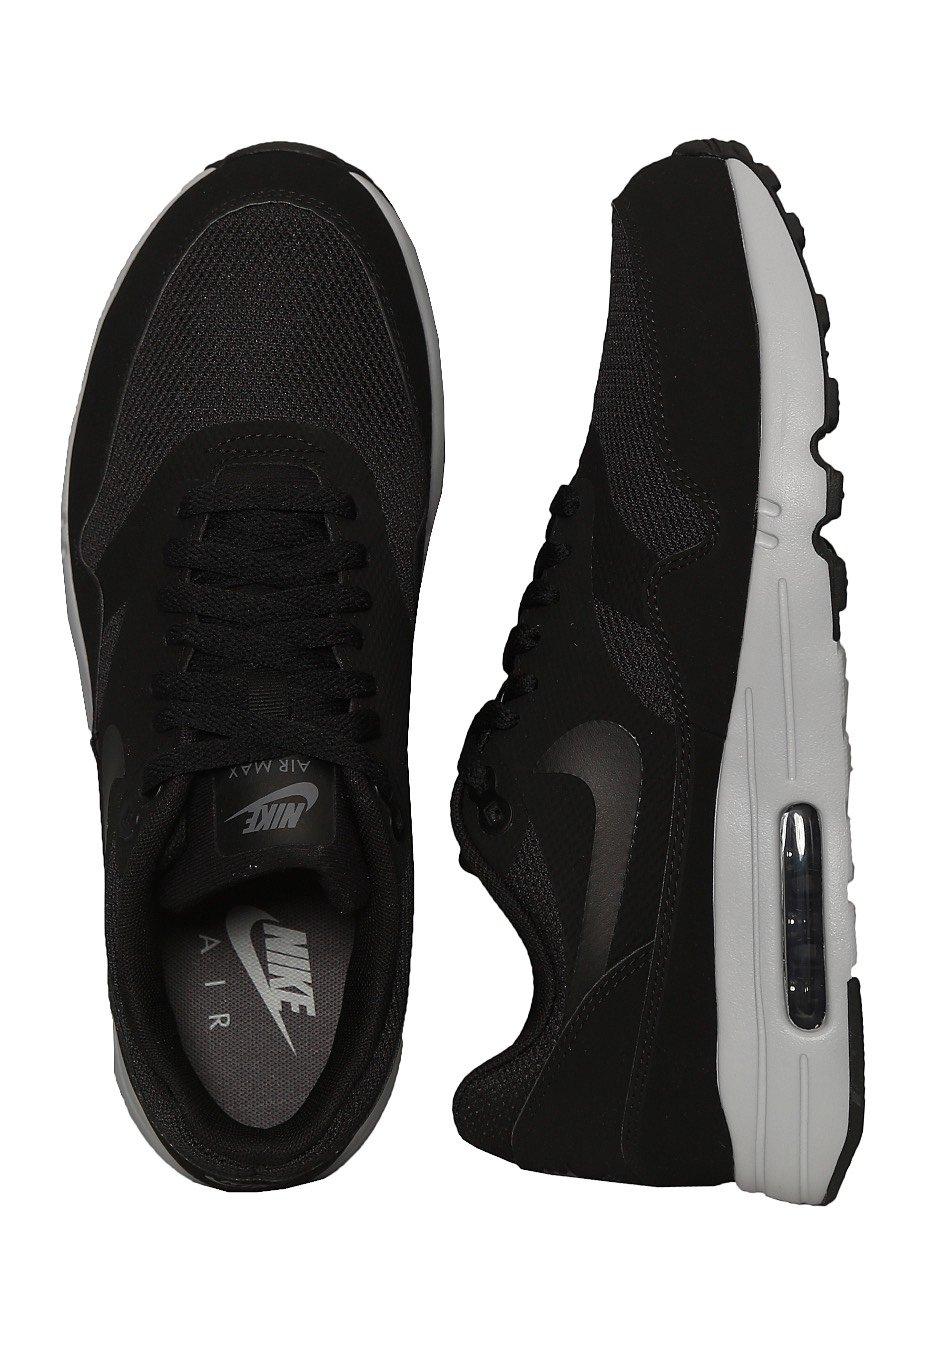 arrives 0d346 e54e6 Nike - Air Max 1 Ultra 2.0 Essential Black/Black/Wolf Grey/Dark Grey - Shoes